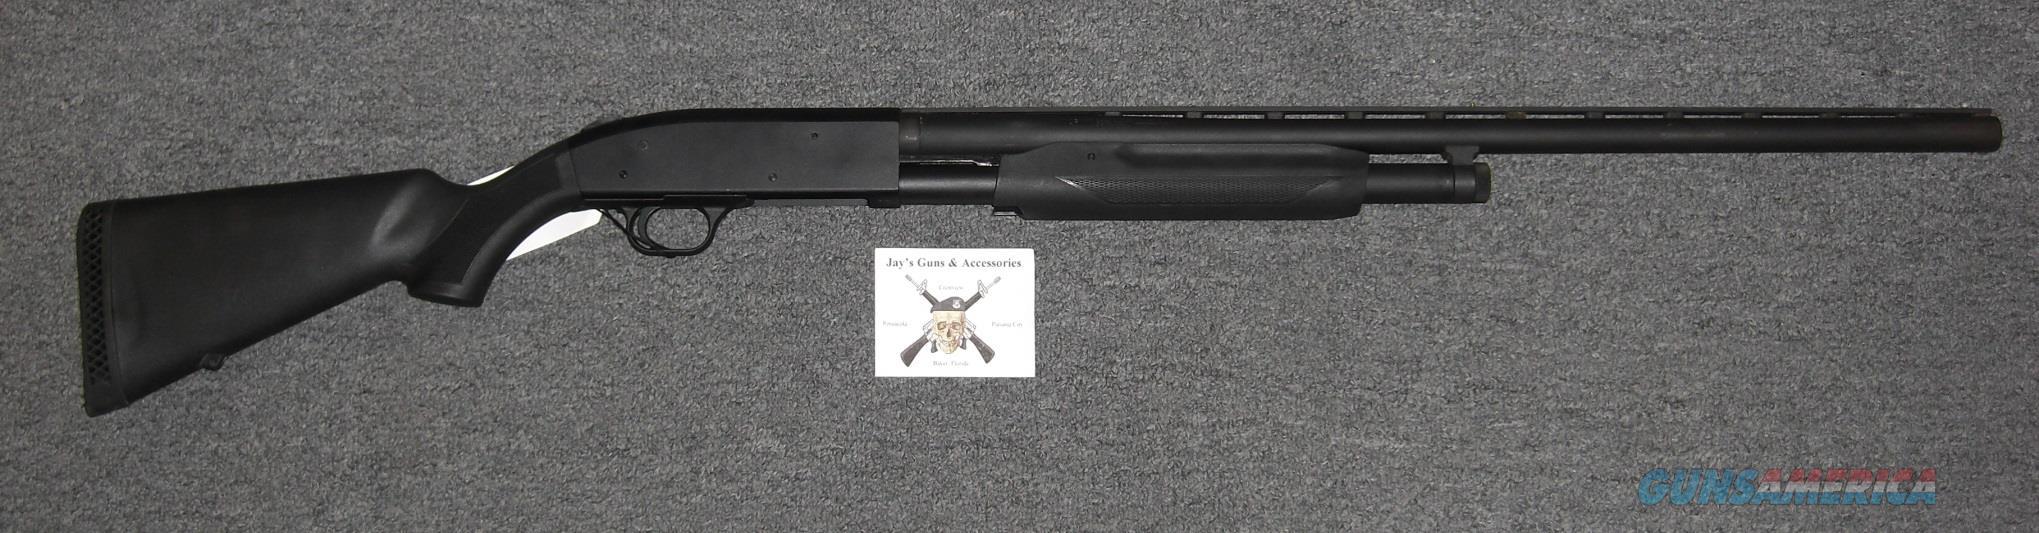 Mossberg 500 (Left Handed)  Guns > Shotguns > Mossberg Shotguns > Pump > Sporting